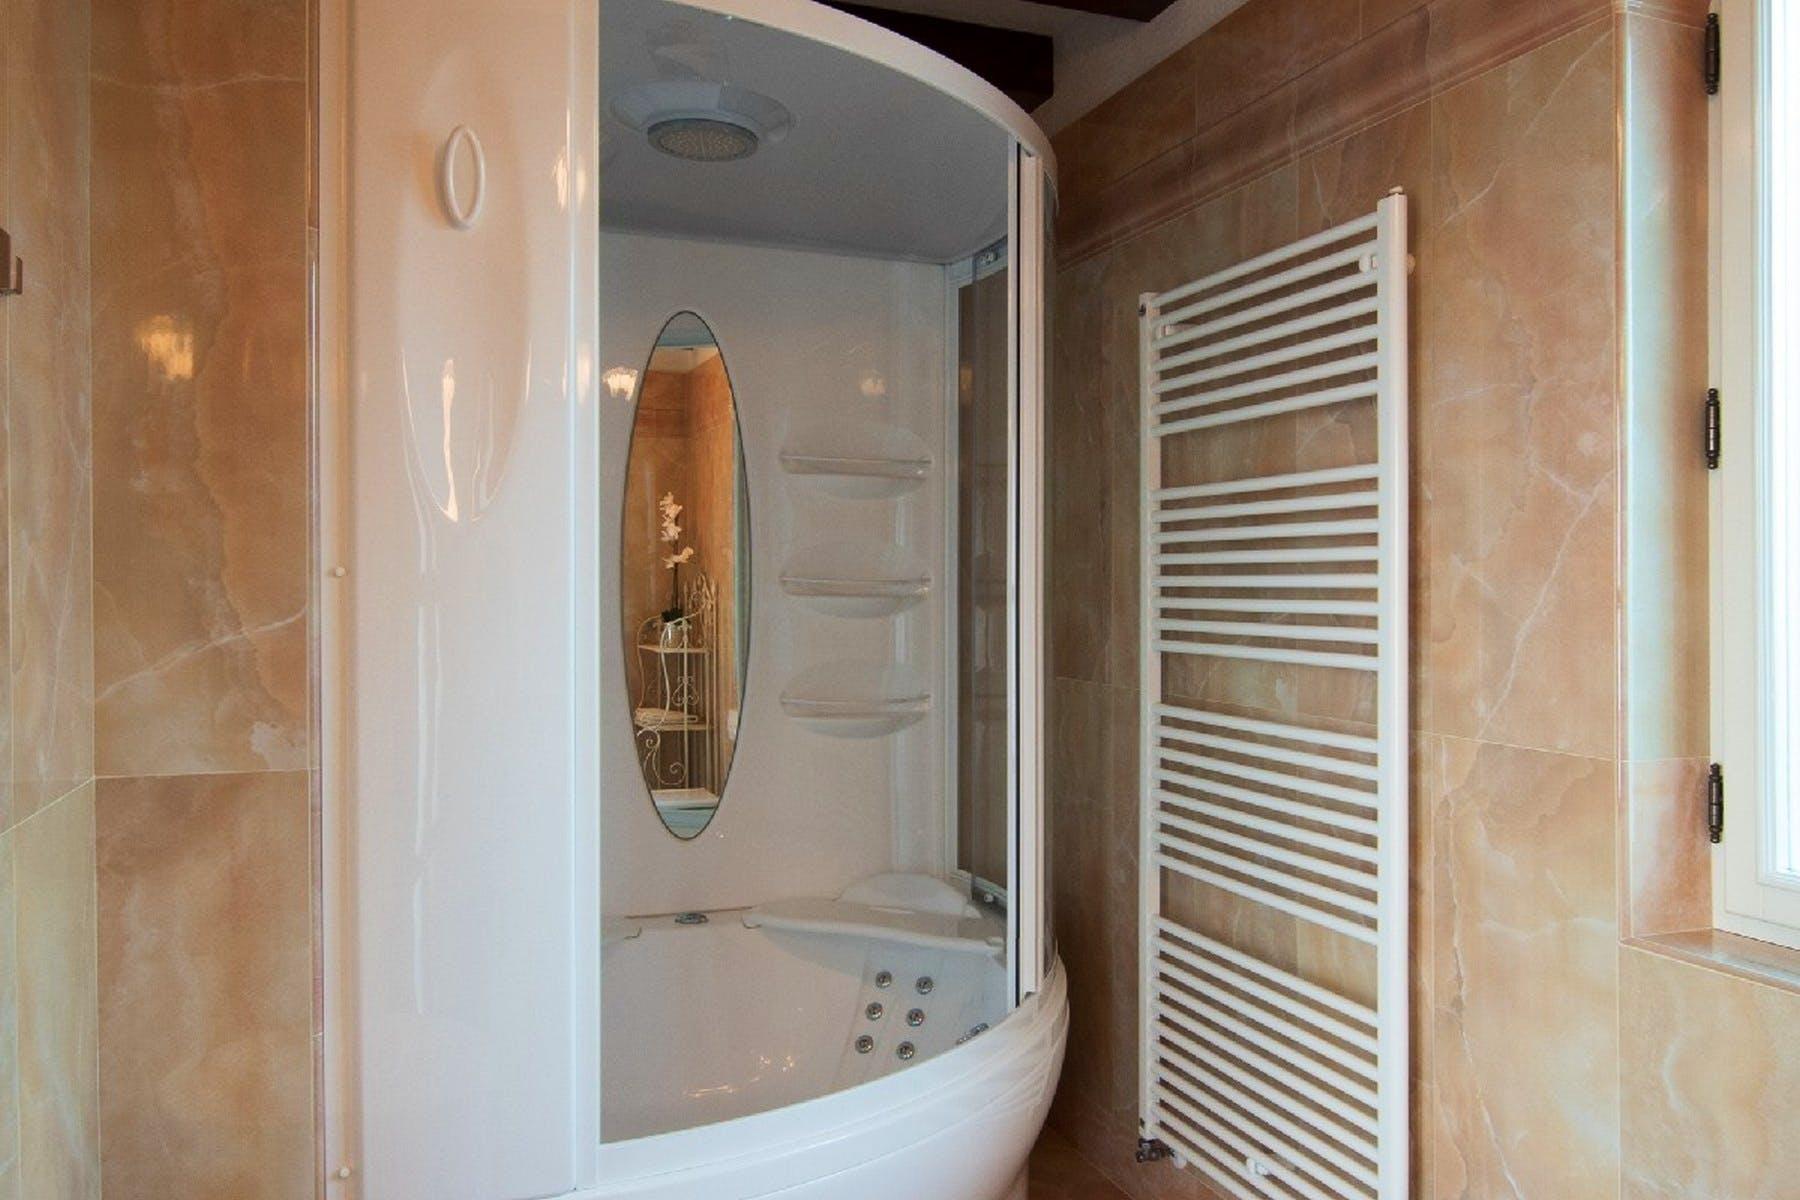 Tuš kabina u kupaonici